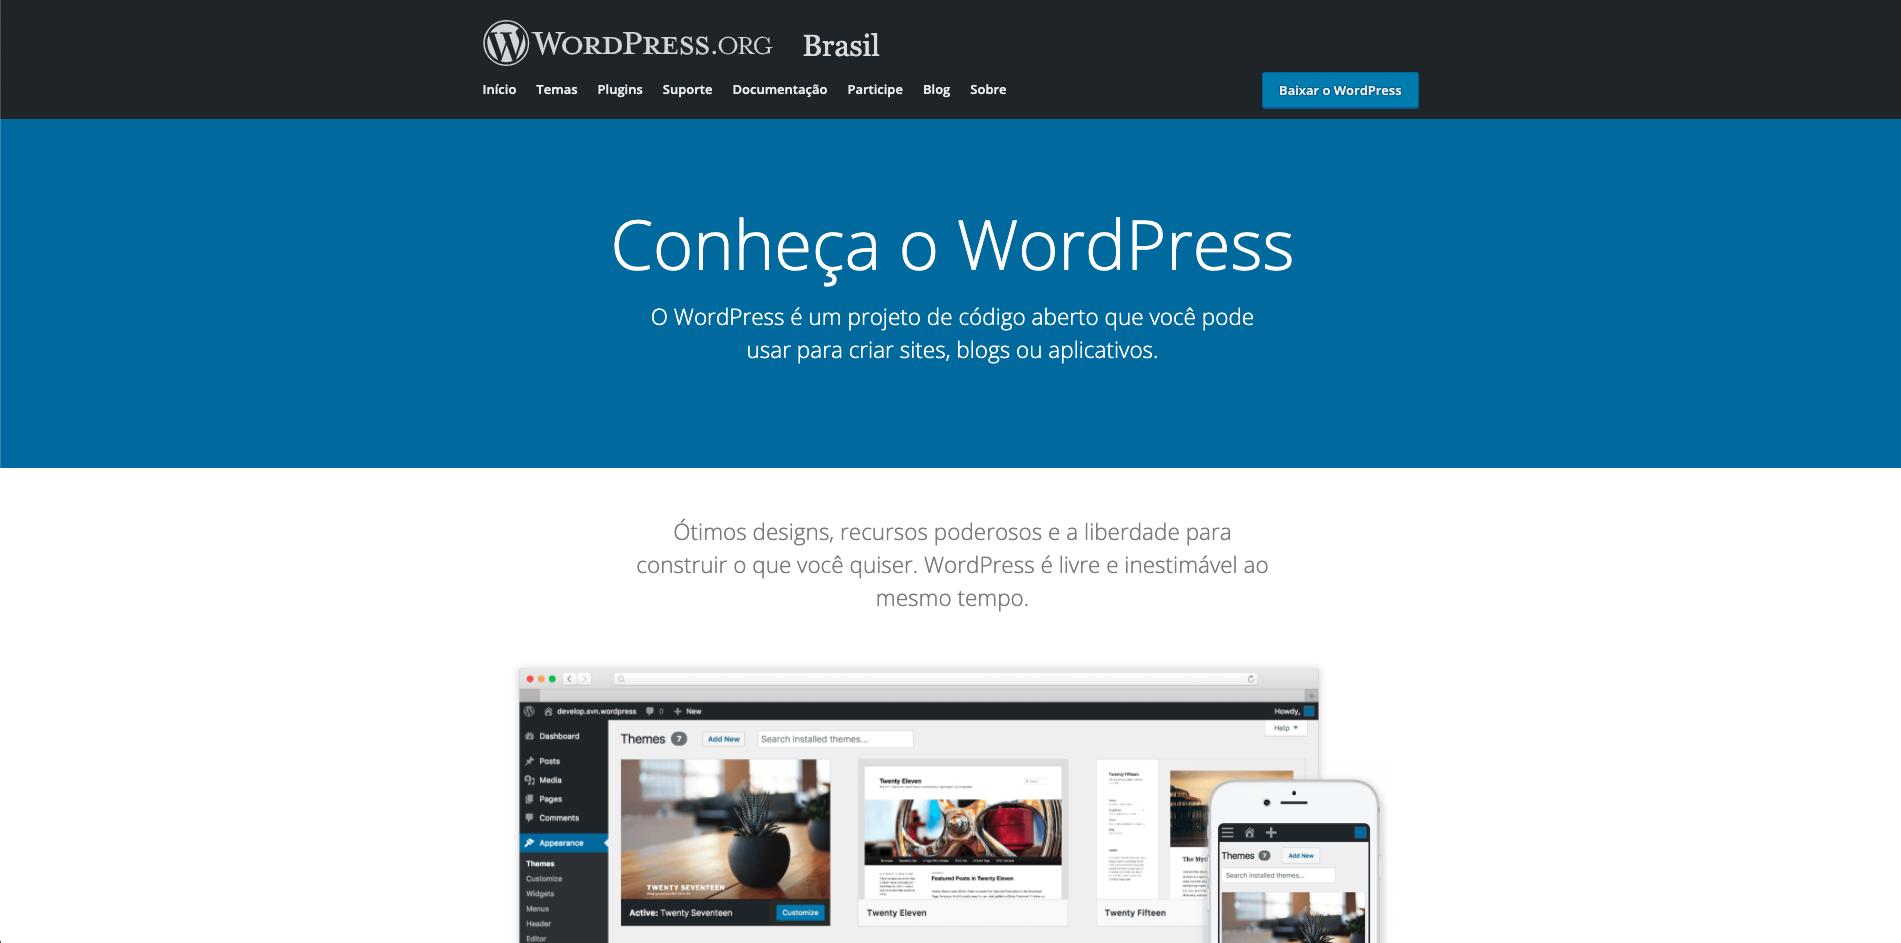 Home do wordpress.org